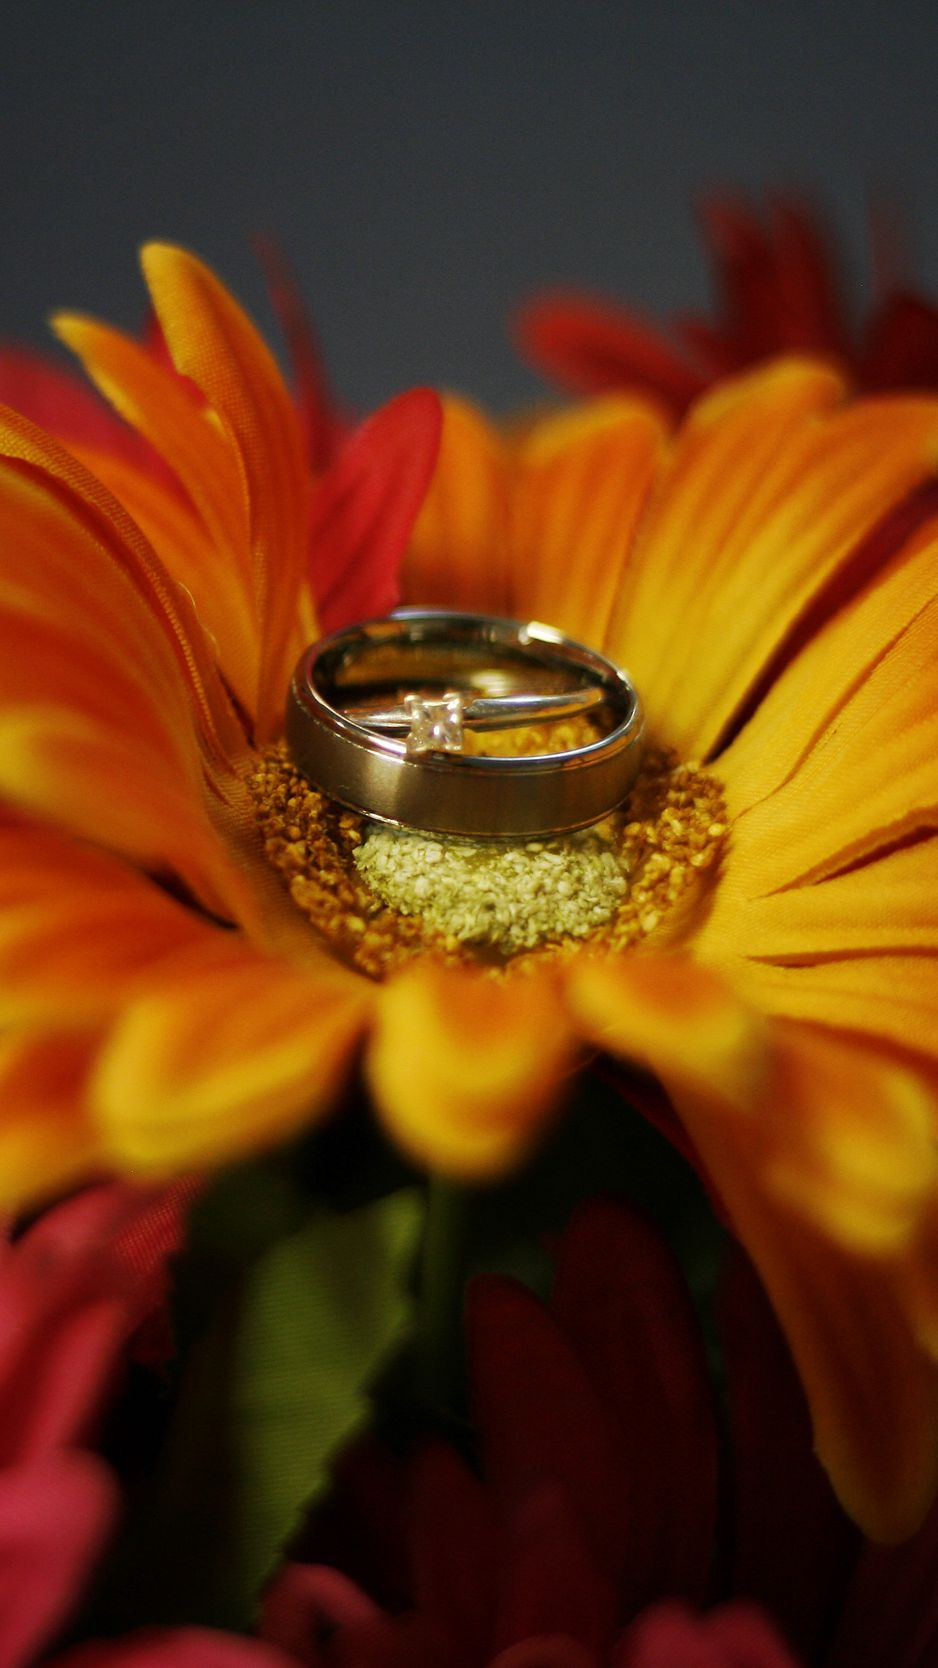 938x1668 Wallpaper flower, petals, wedding rings, wedding